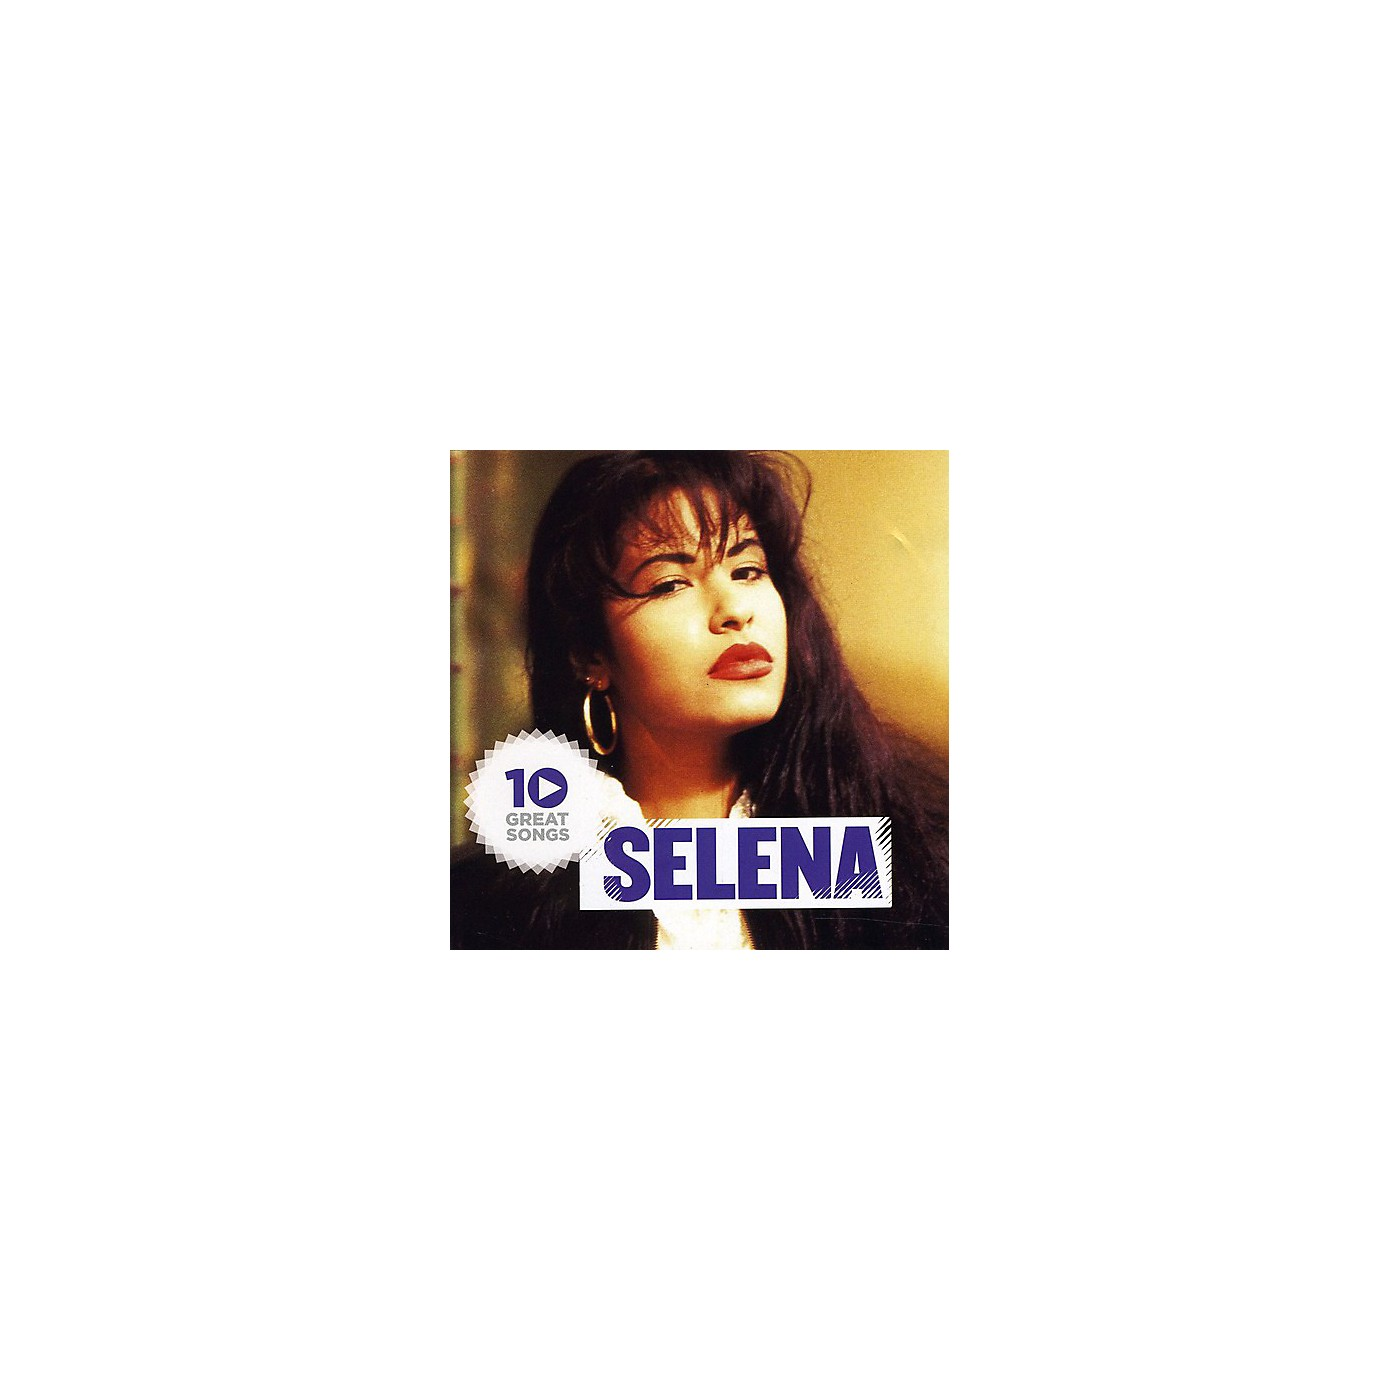 Alliance Selena - 10 Great Songs (CD) thumbnail